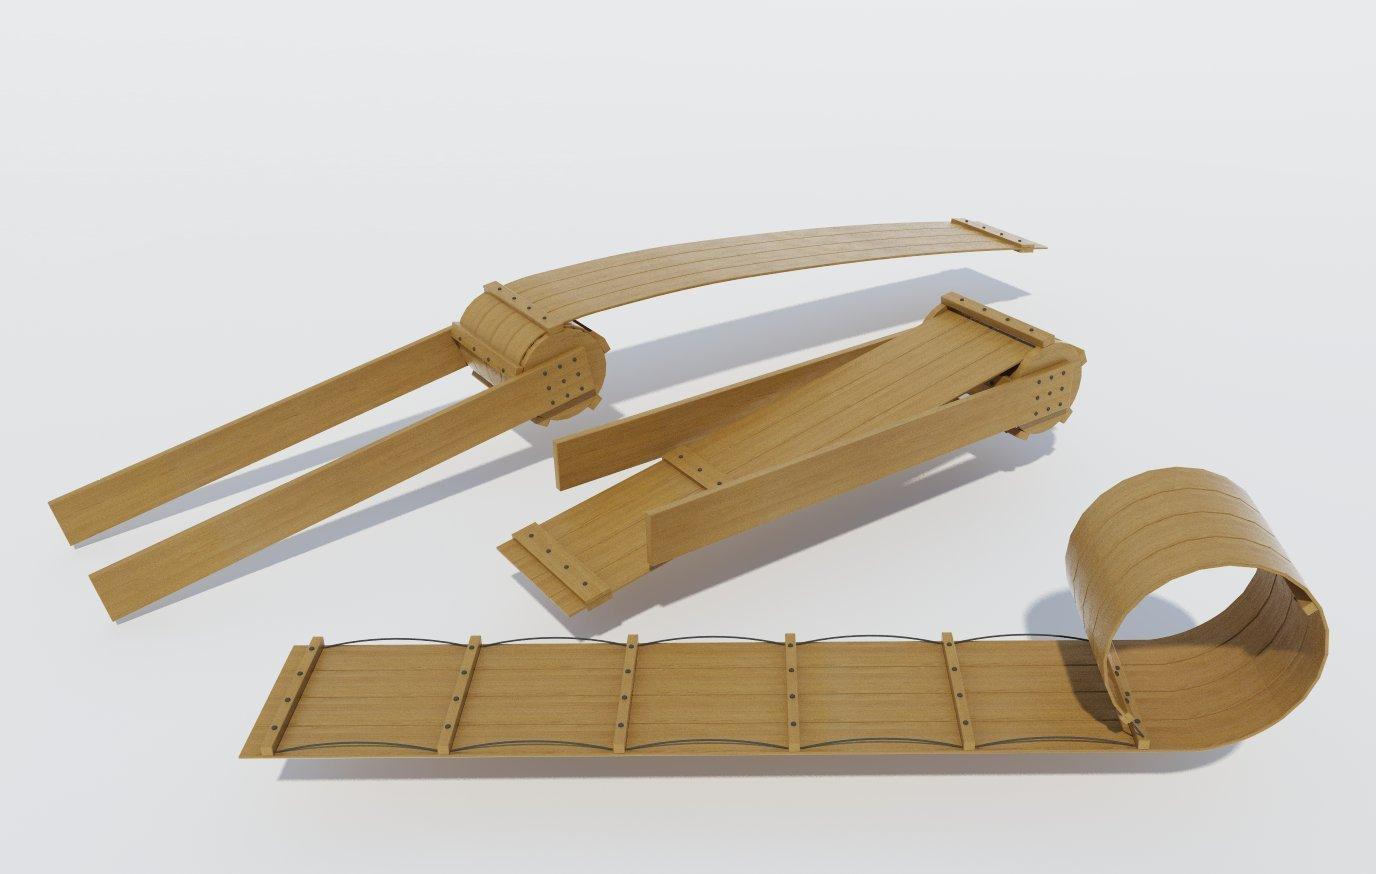 amazon com build your own wooden toboggan diy plans fun sled